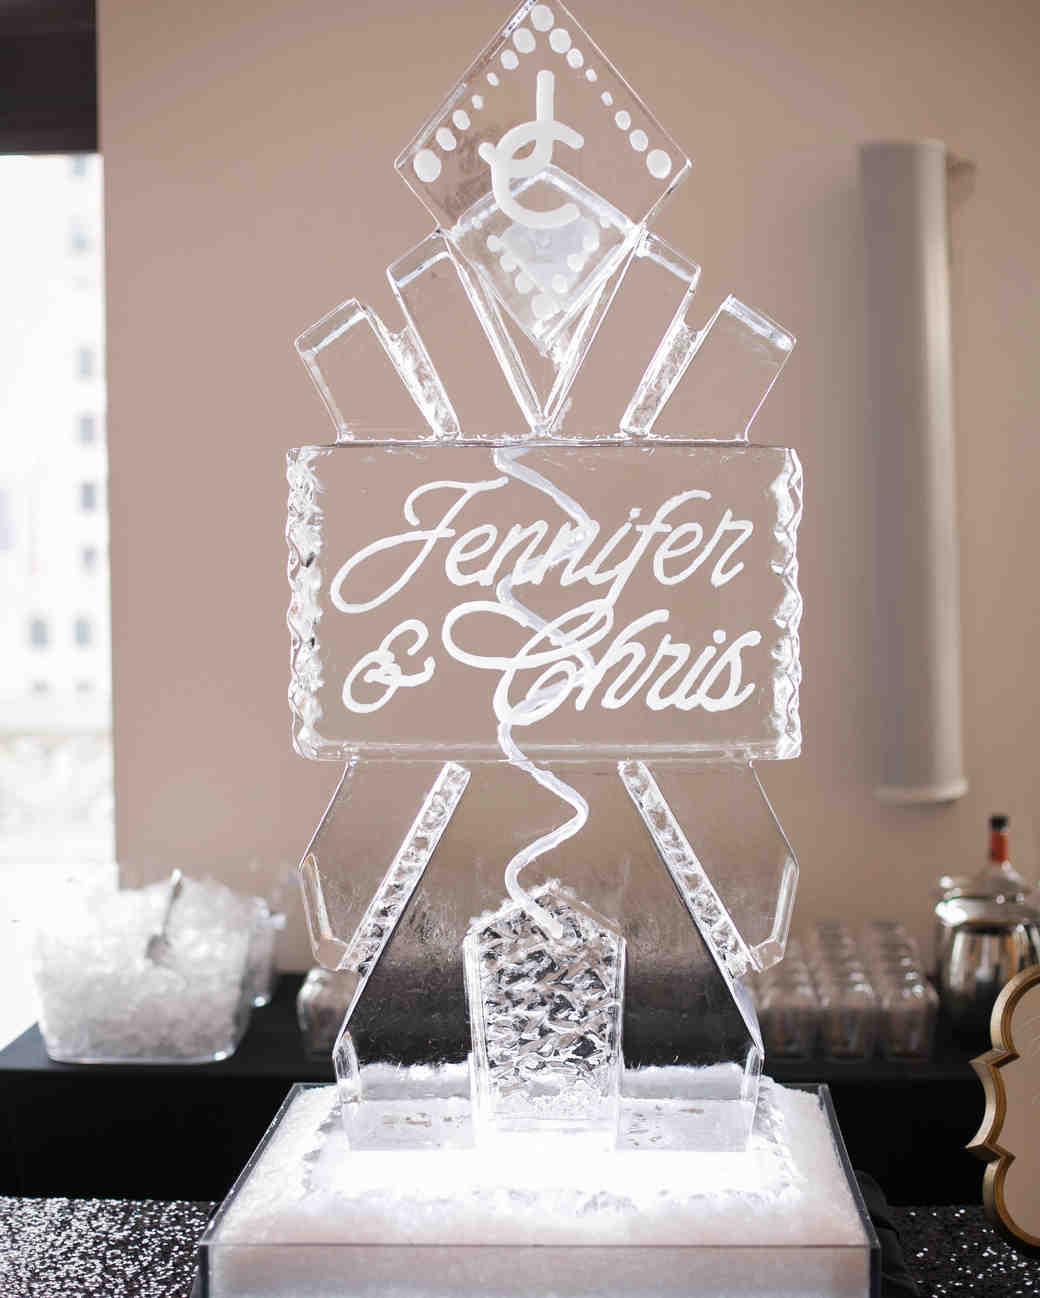 wedding ice sculpture bride and groom names